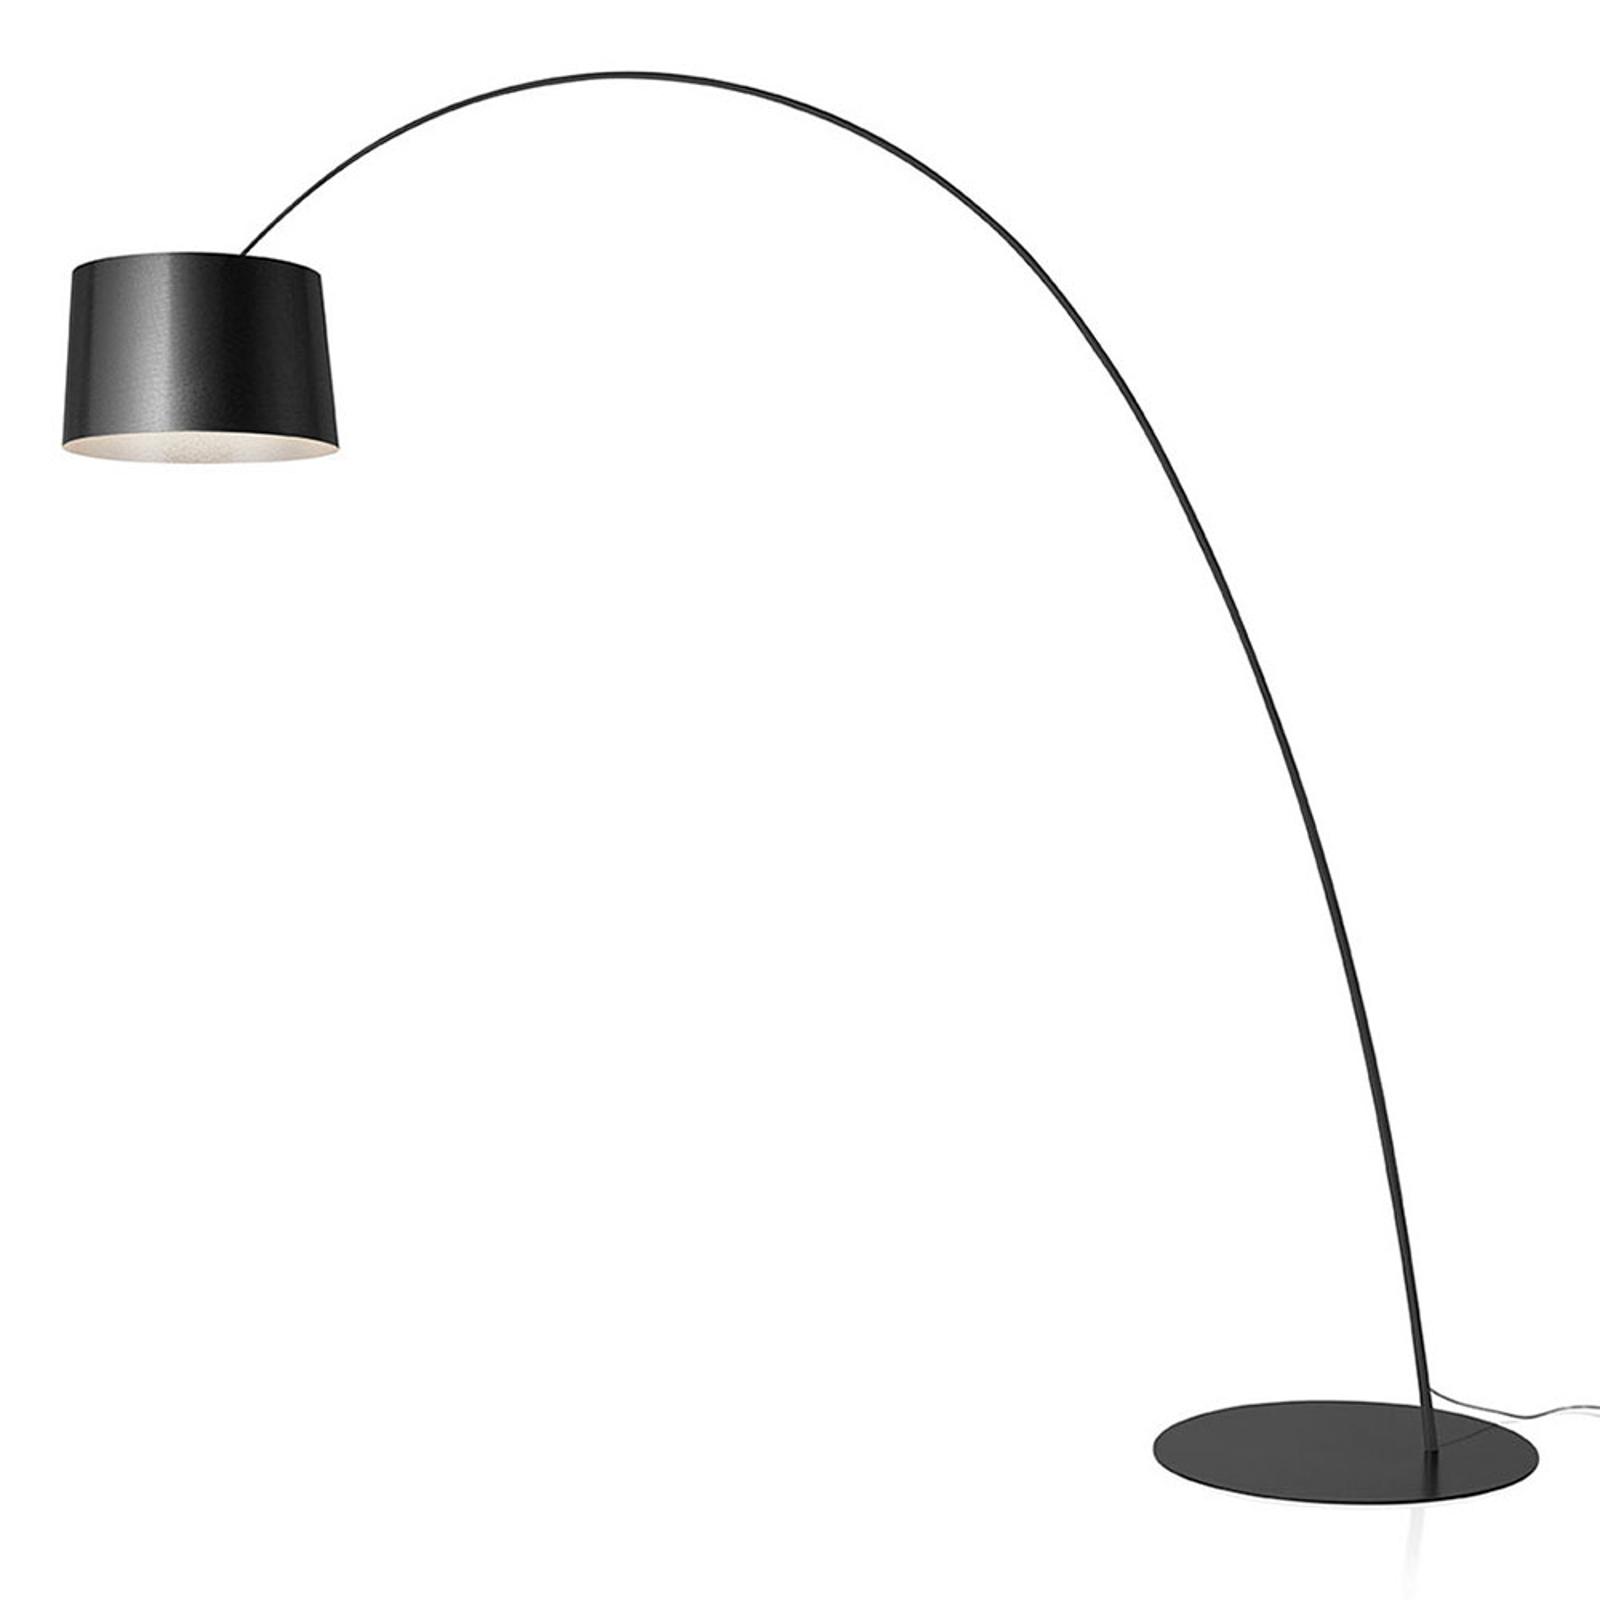 Foscarini Twiggy MyLight LED-Stehlampe CCT graphit